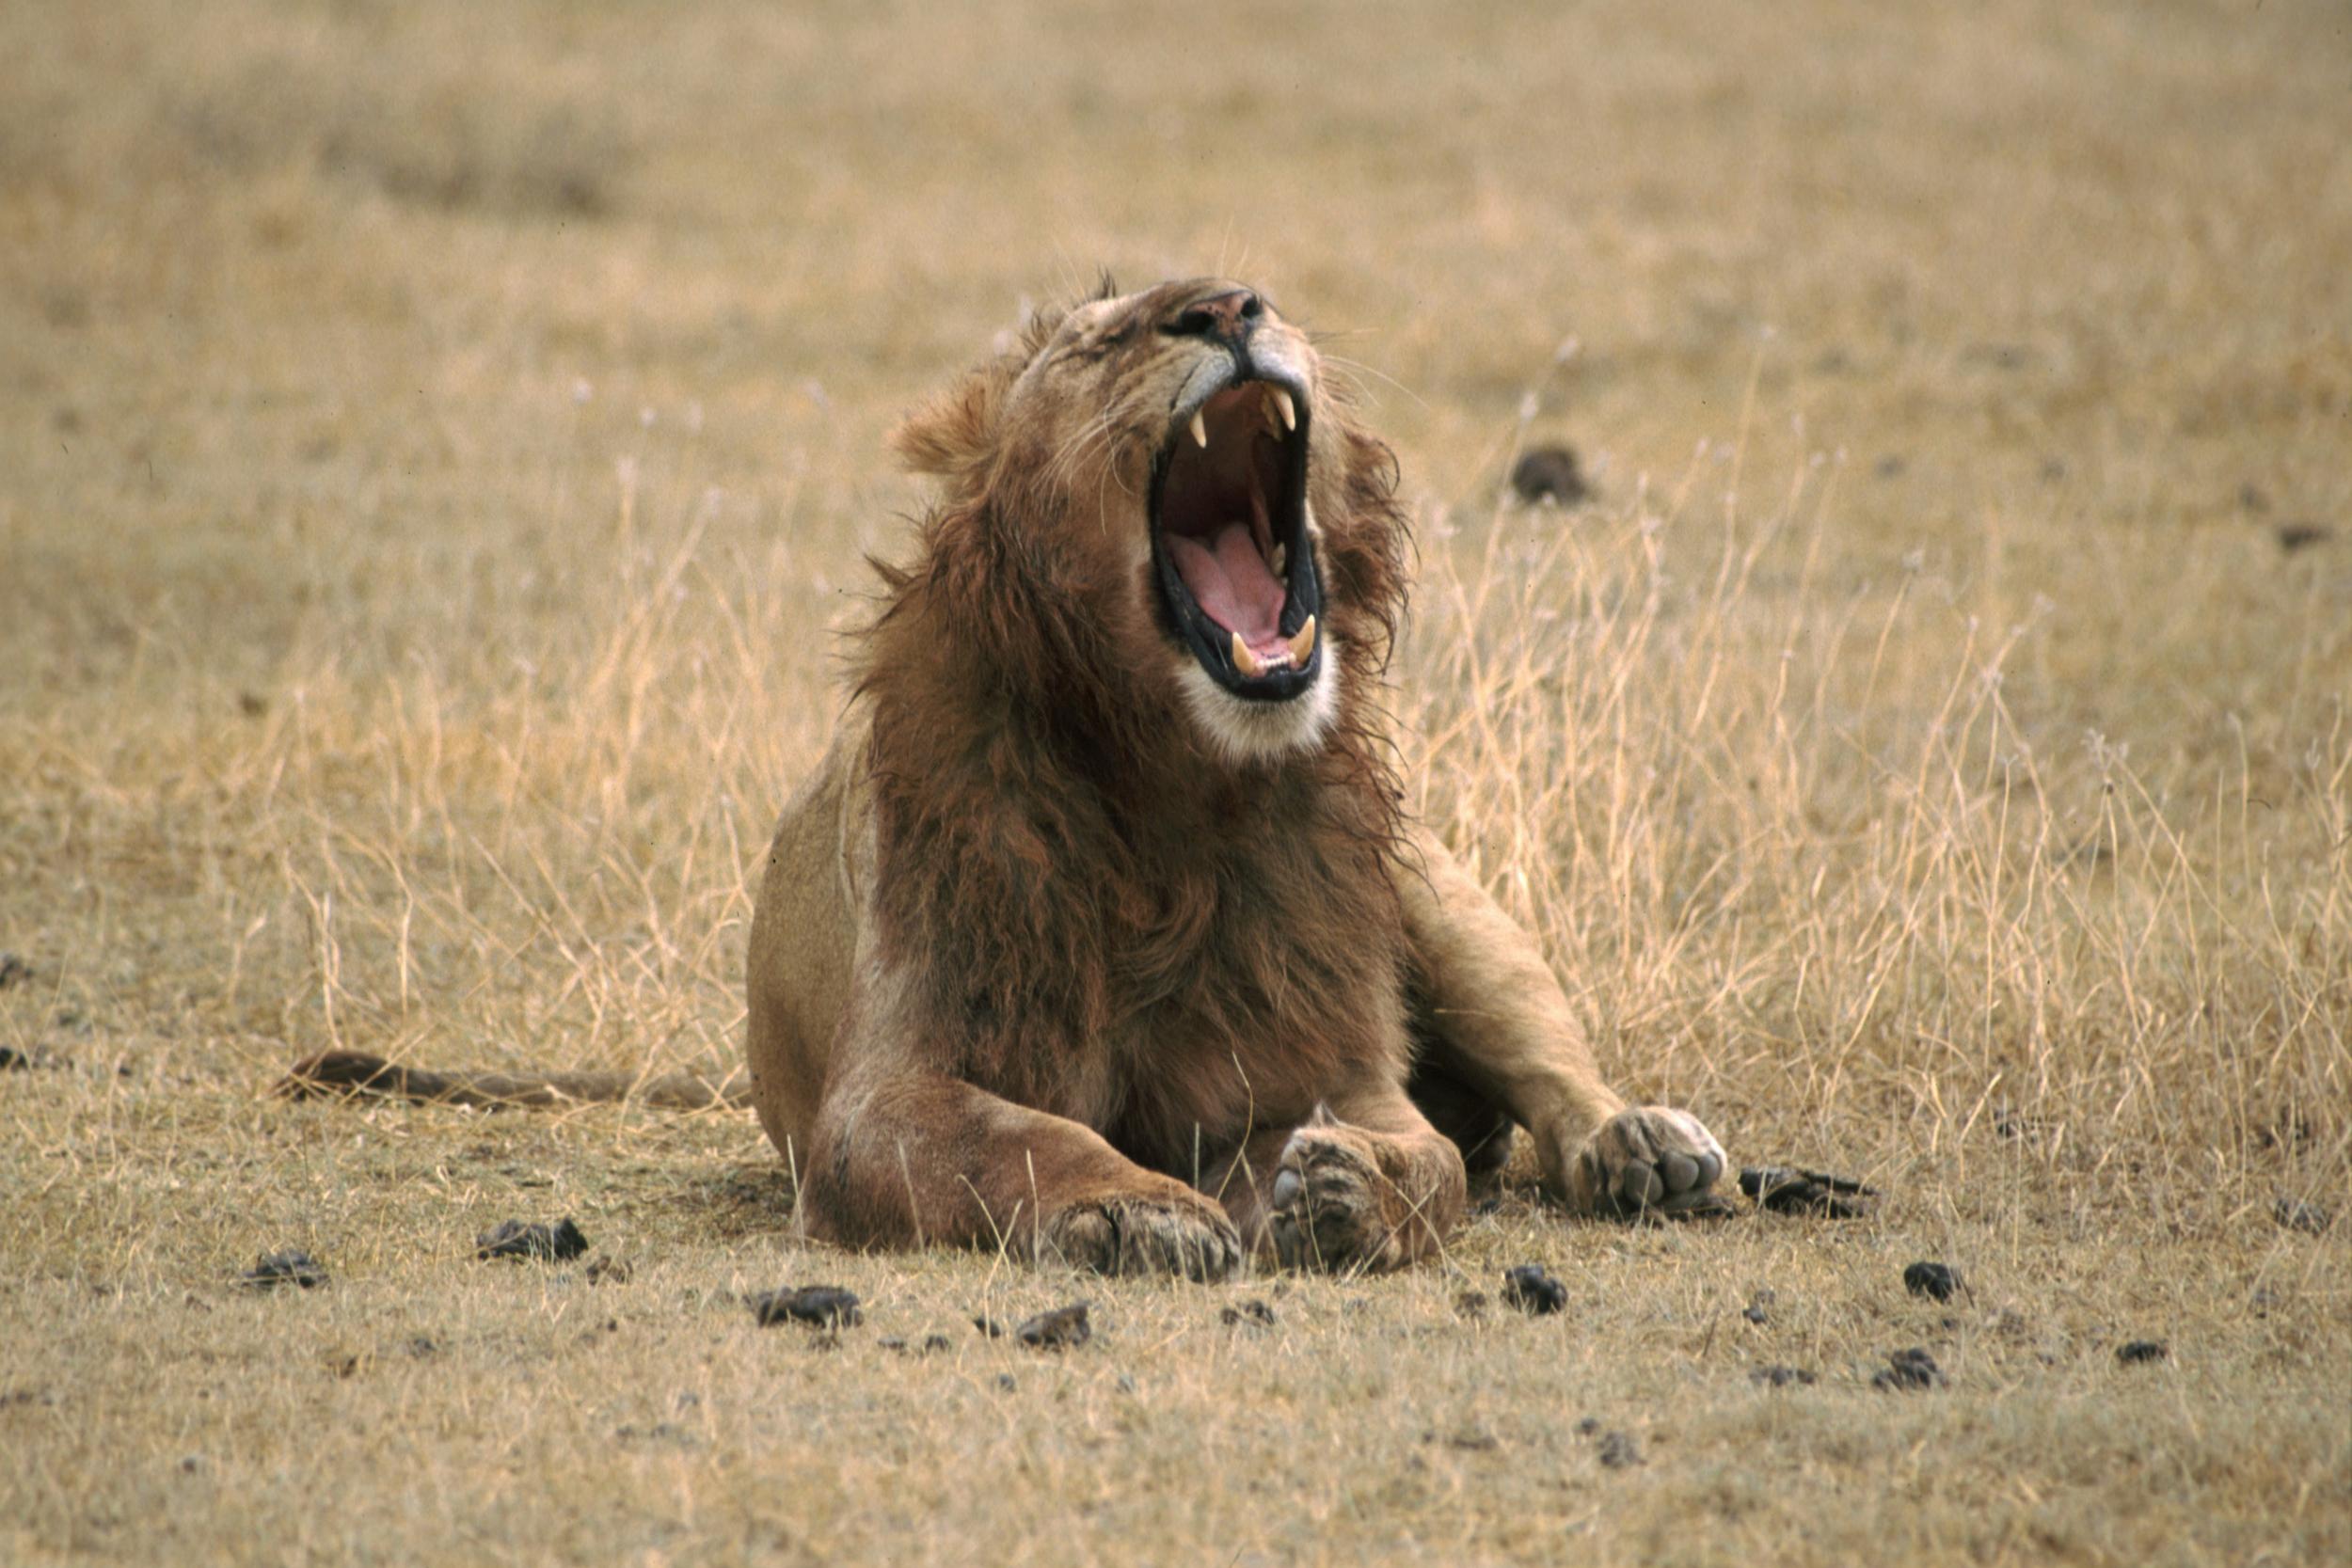 Lion_Yawning copy.jpg